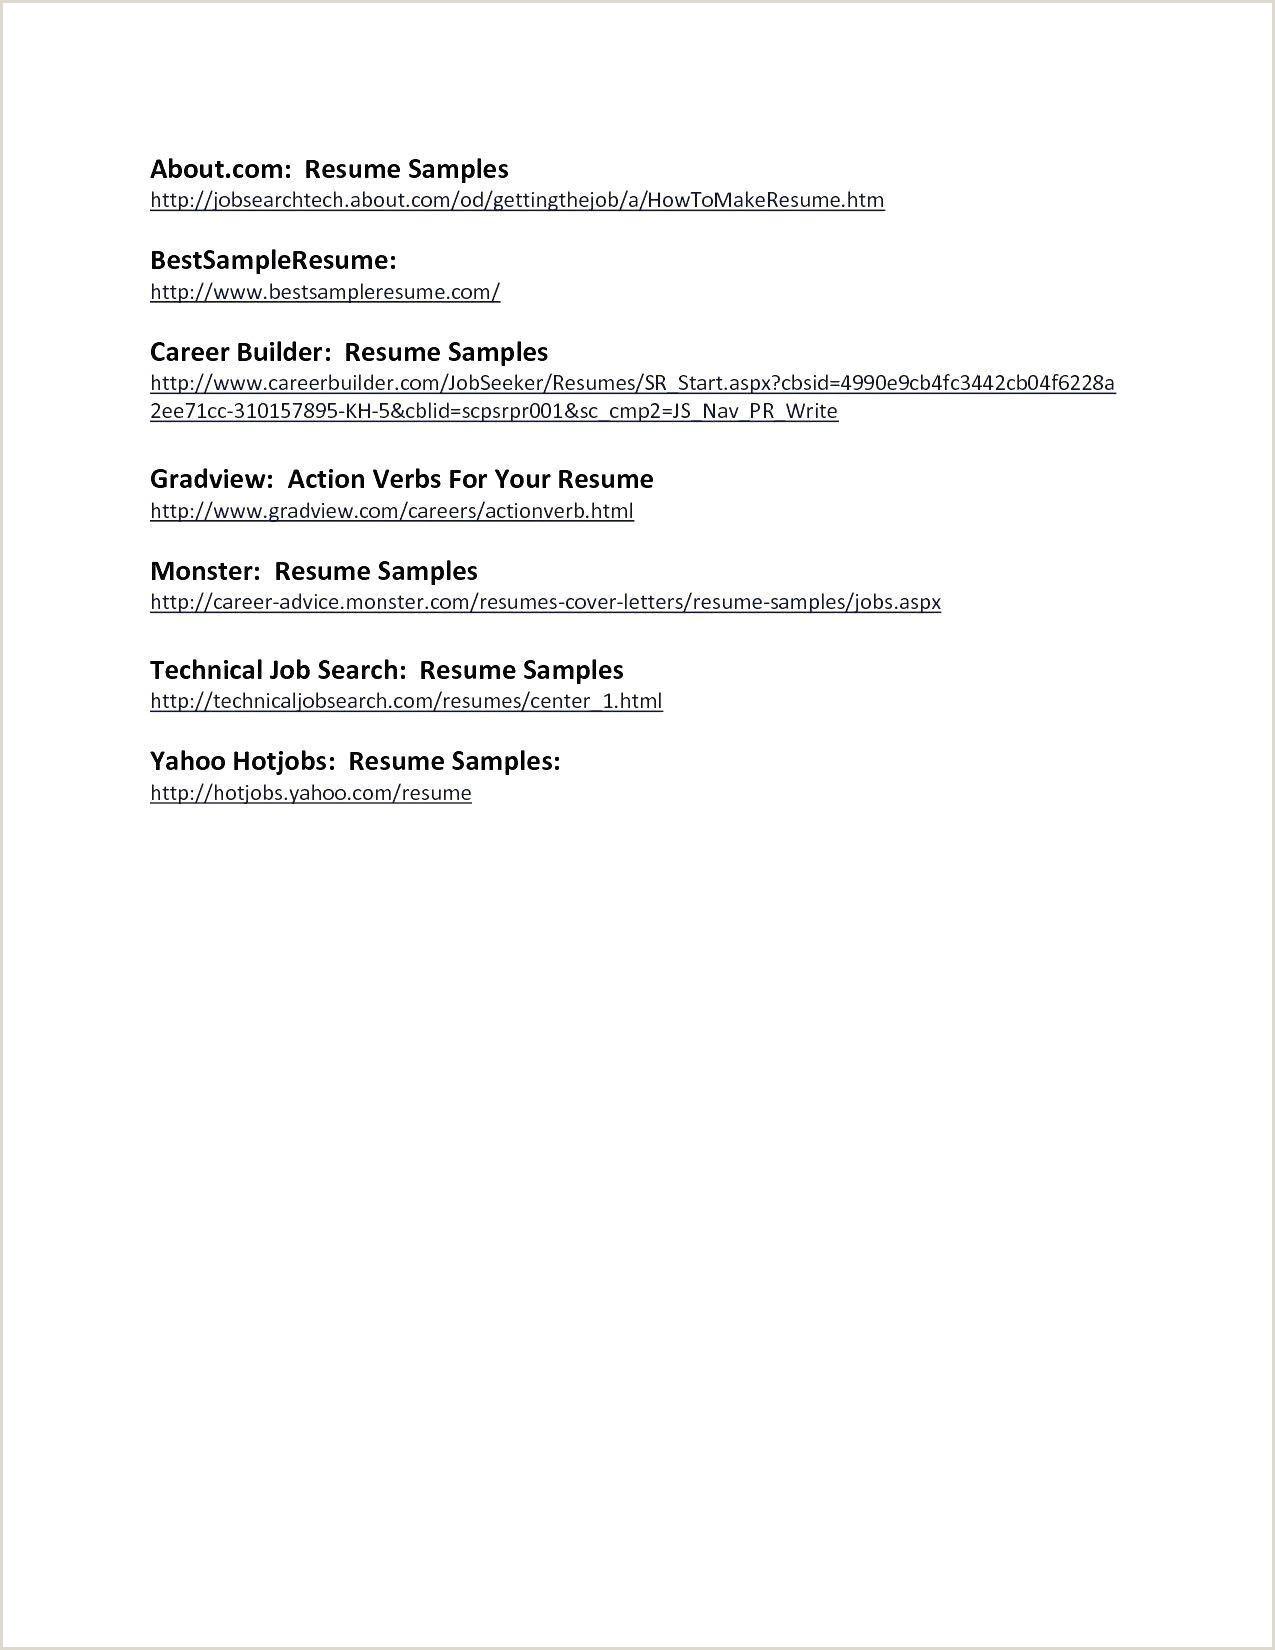 Curriculum Vitae En Blanco Para Rellenar E Imprimir Plantillas De Curriculum Vitae Para Rellenar Y Imprimir